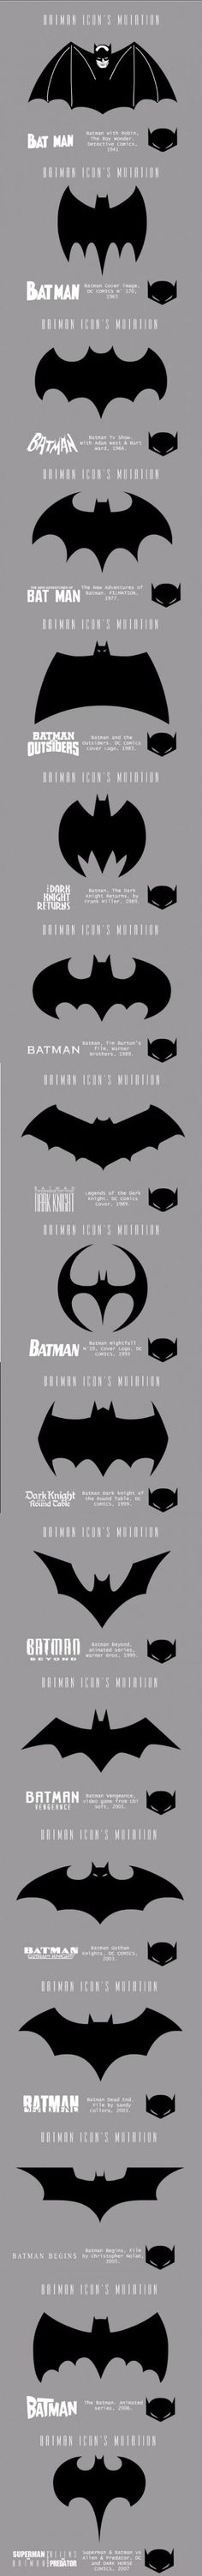 The Evolution Of The Bat symbol.